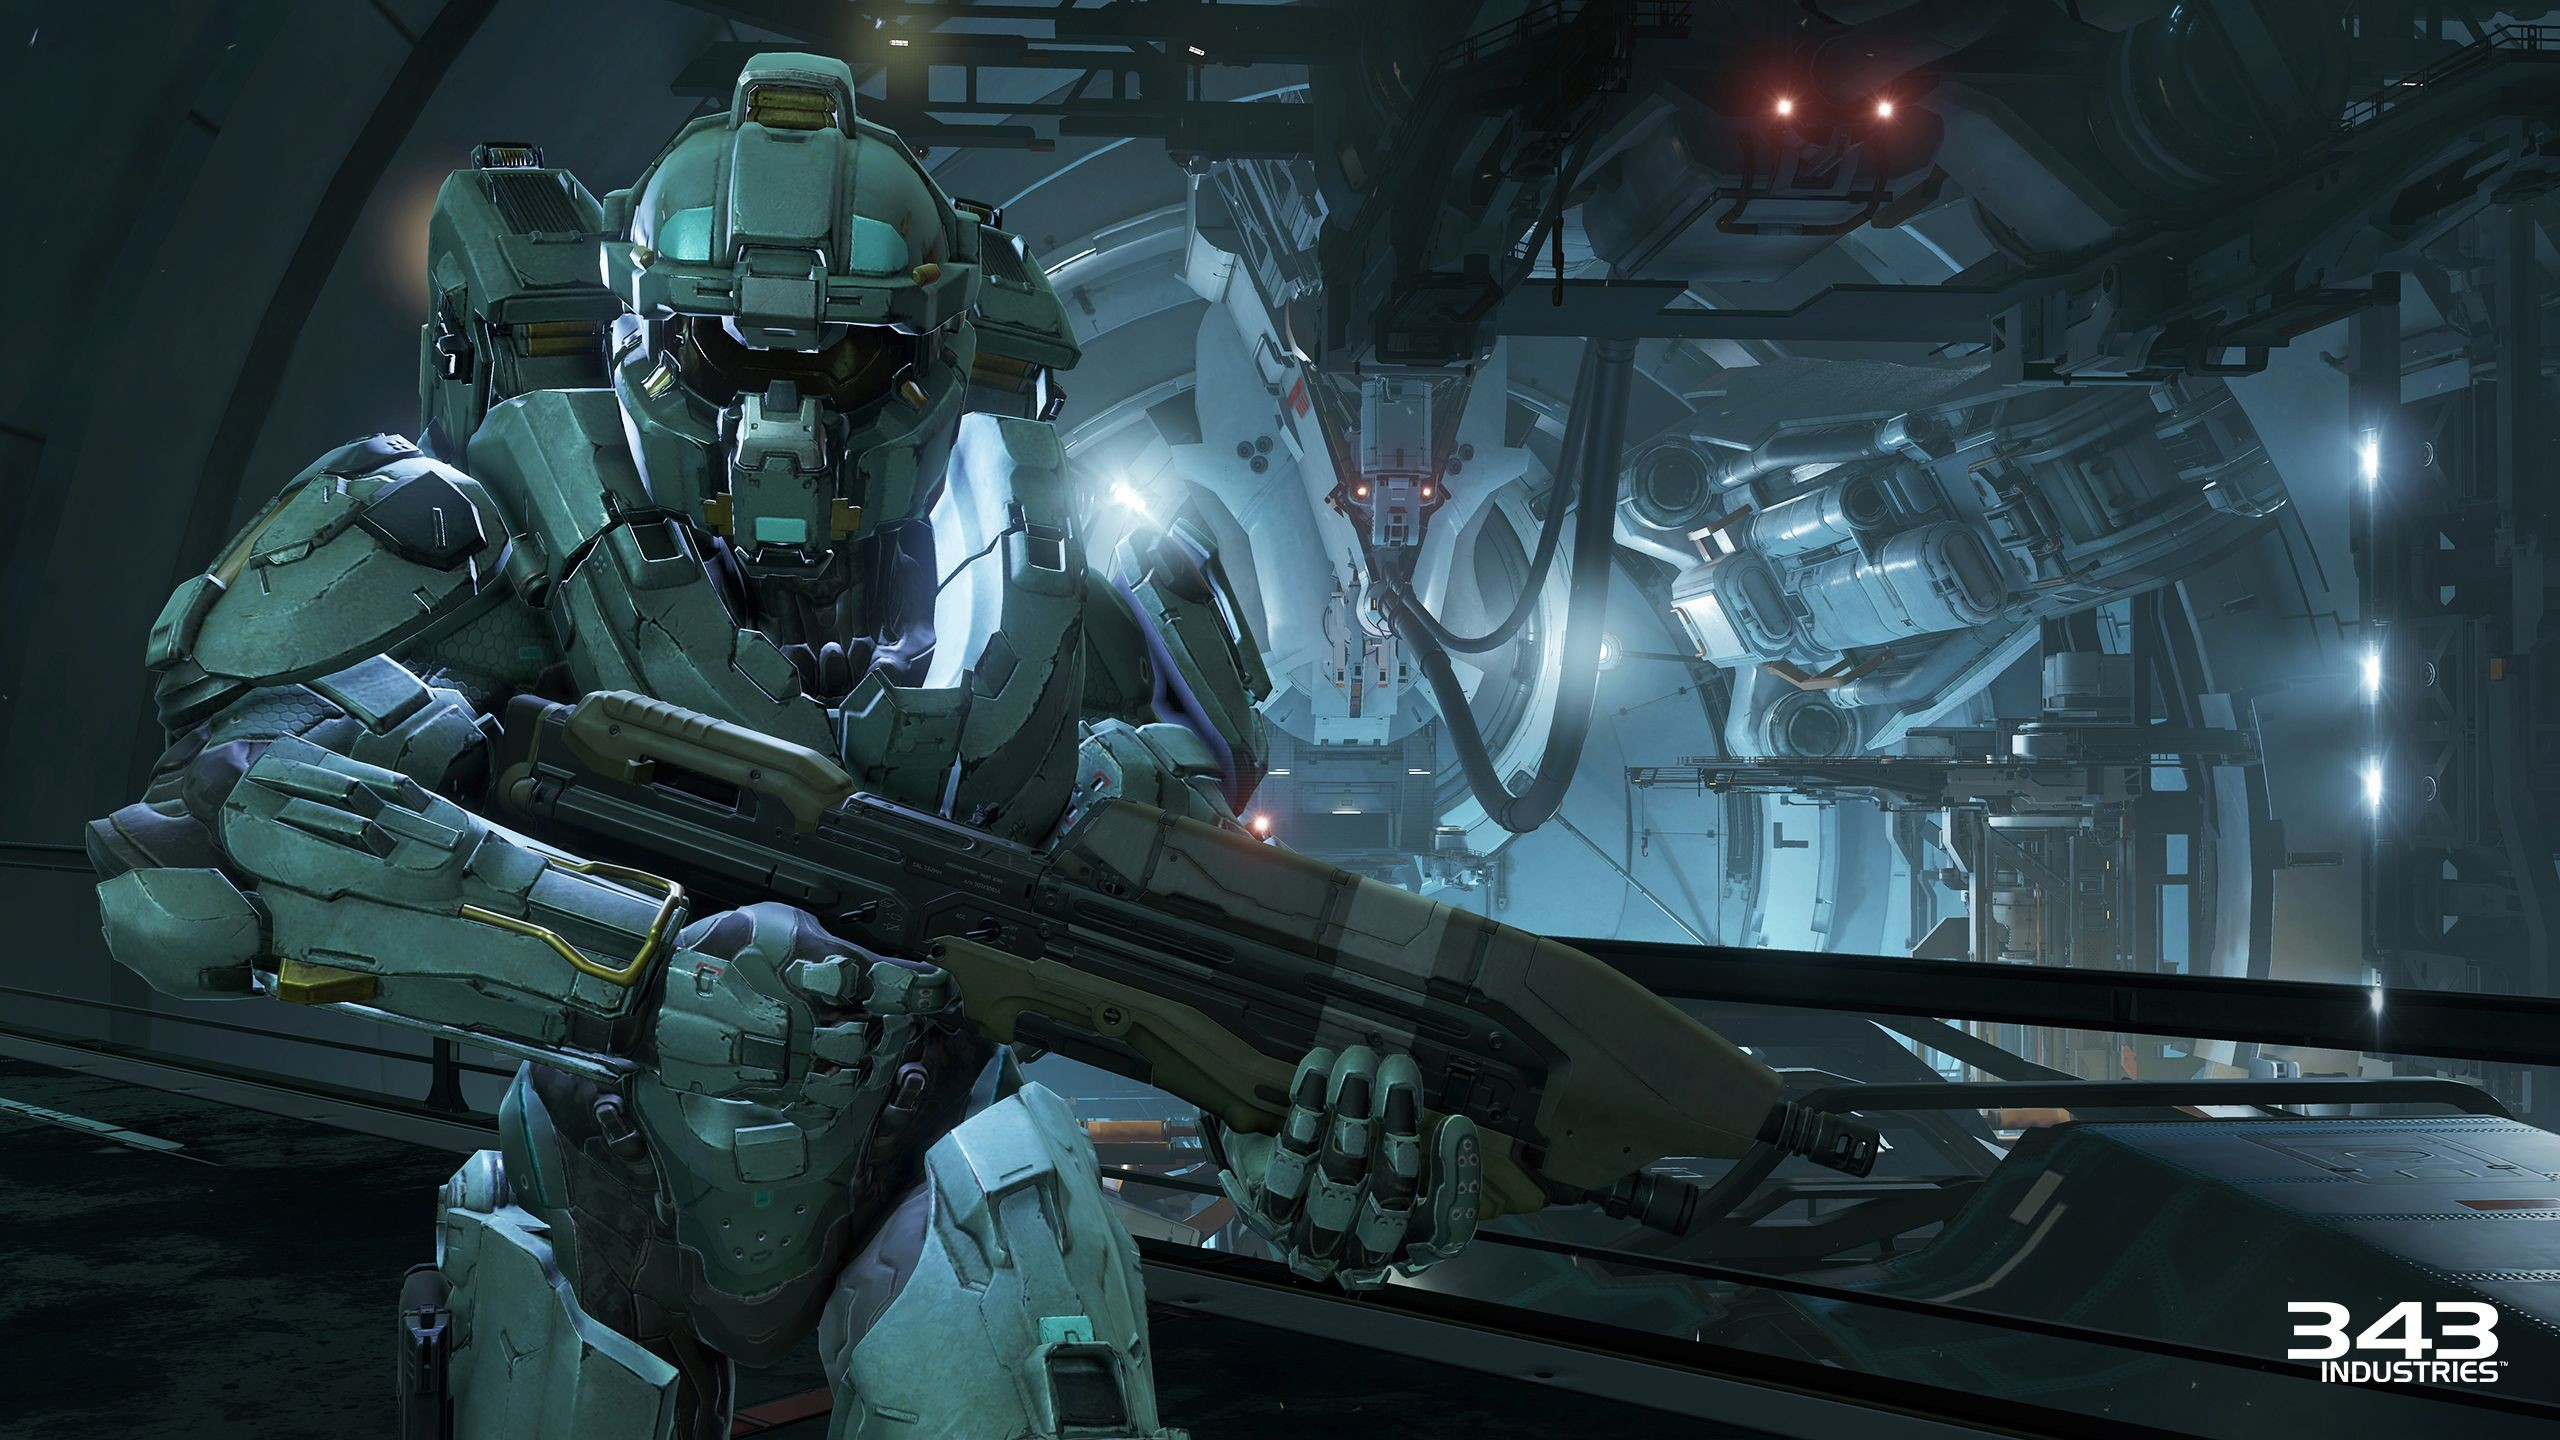 h5-guardians-blue-team-fred